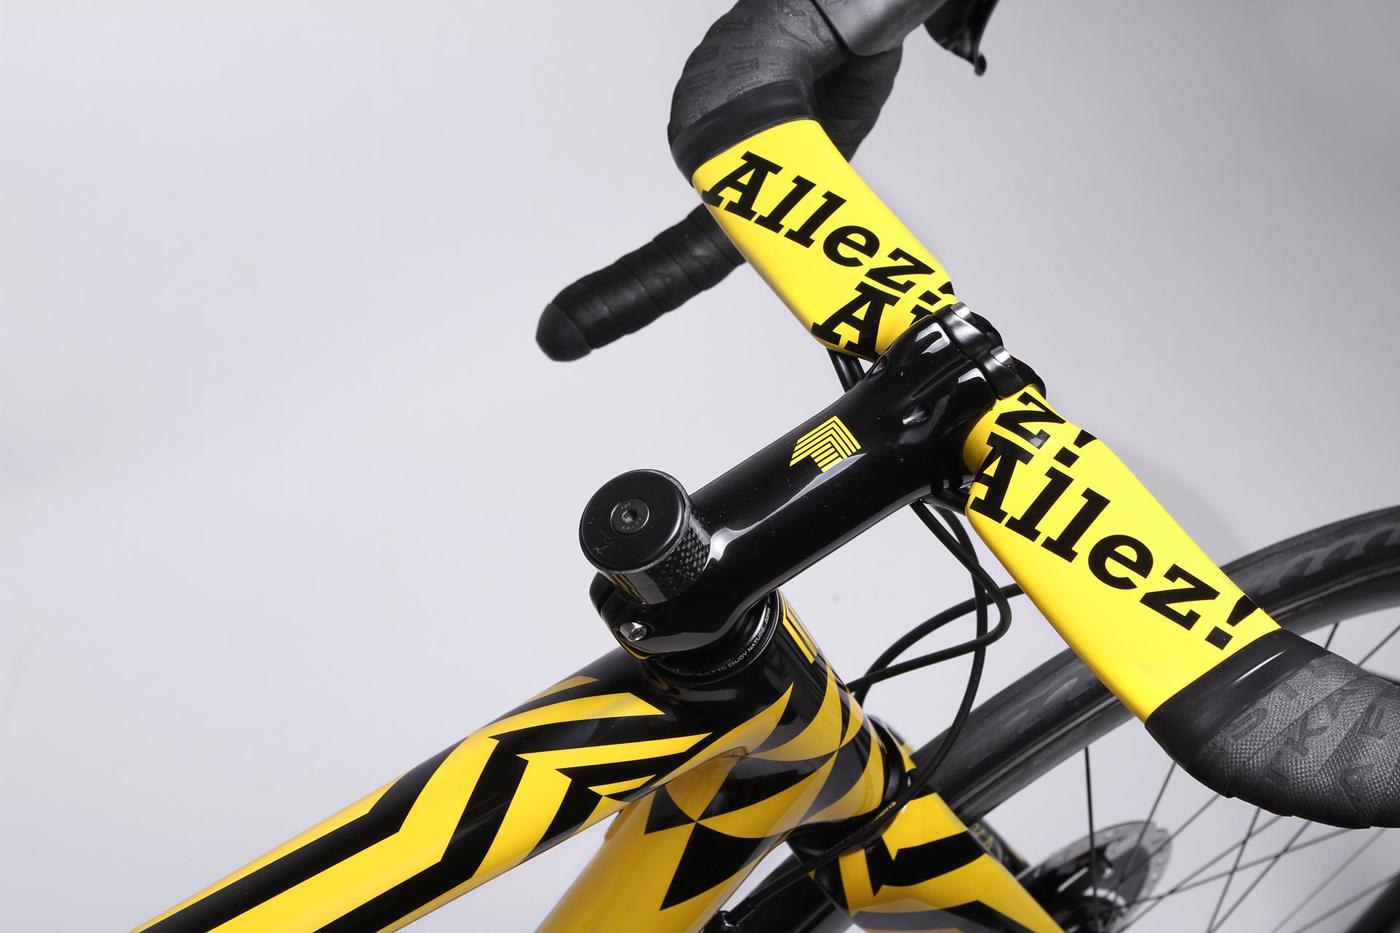 Festka's Limited Edition Tour de France One Spectre Road Bike